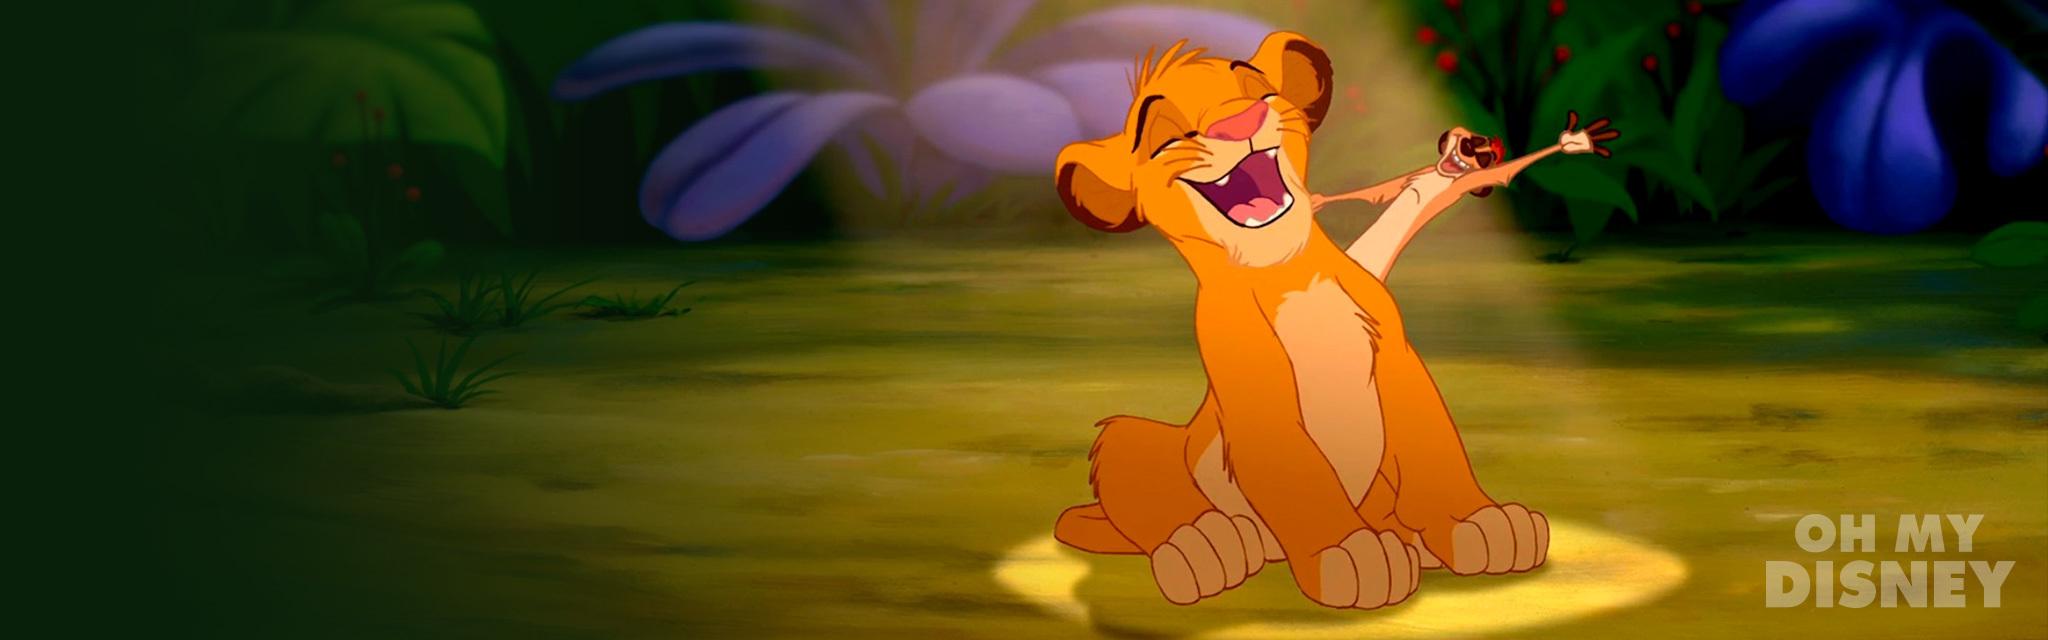 OMD - QUIZ: Quiz: What's Your Disney Theme Song? - Hero